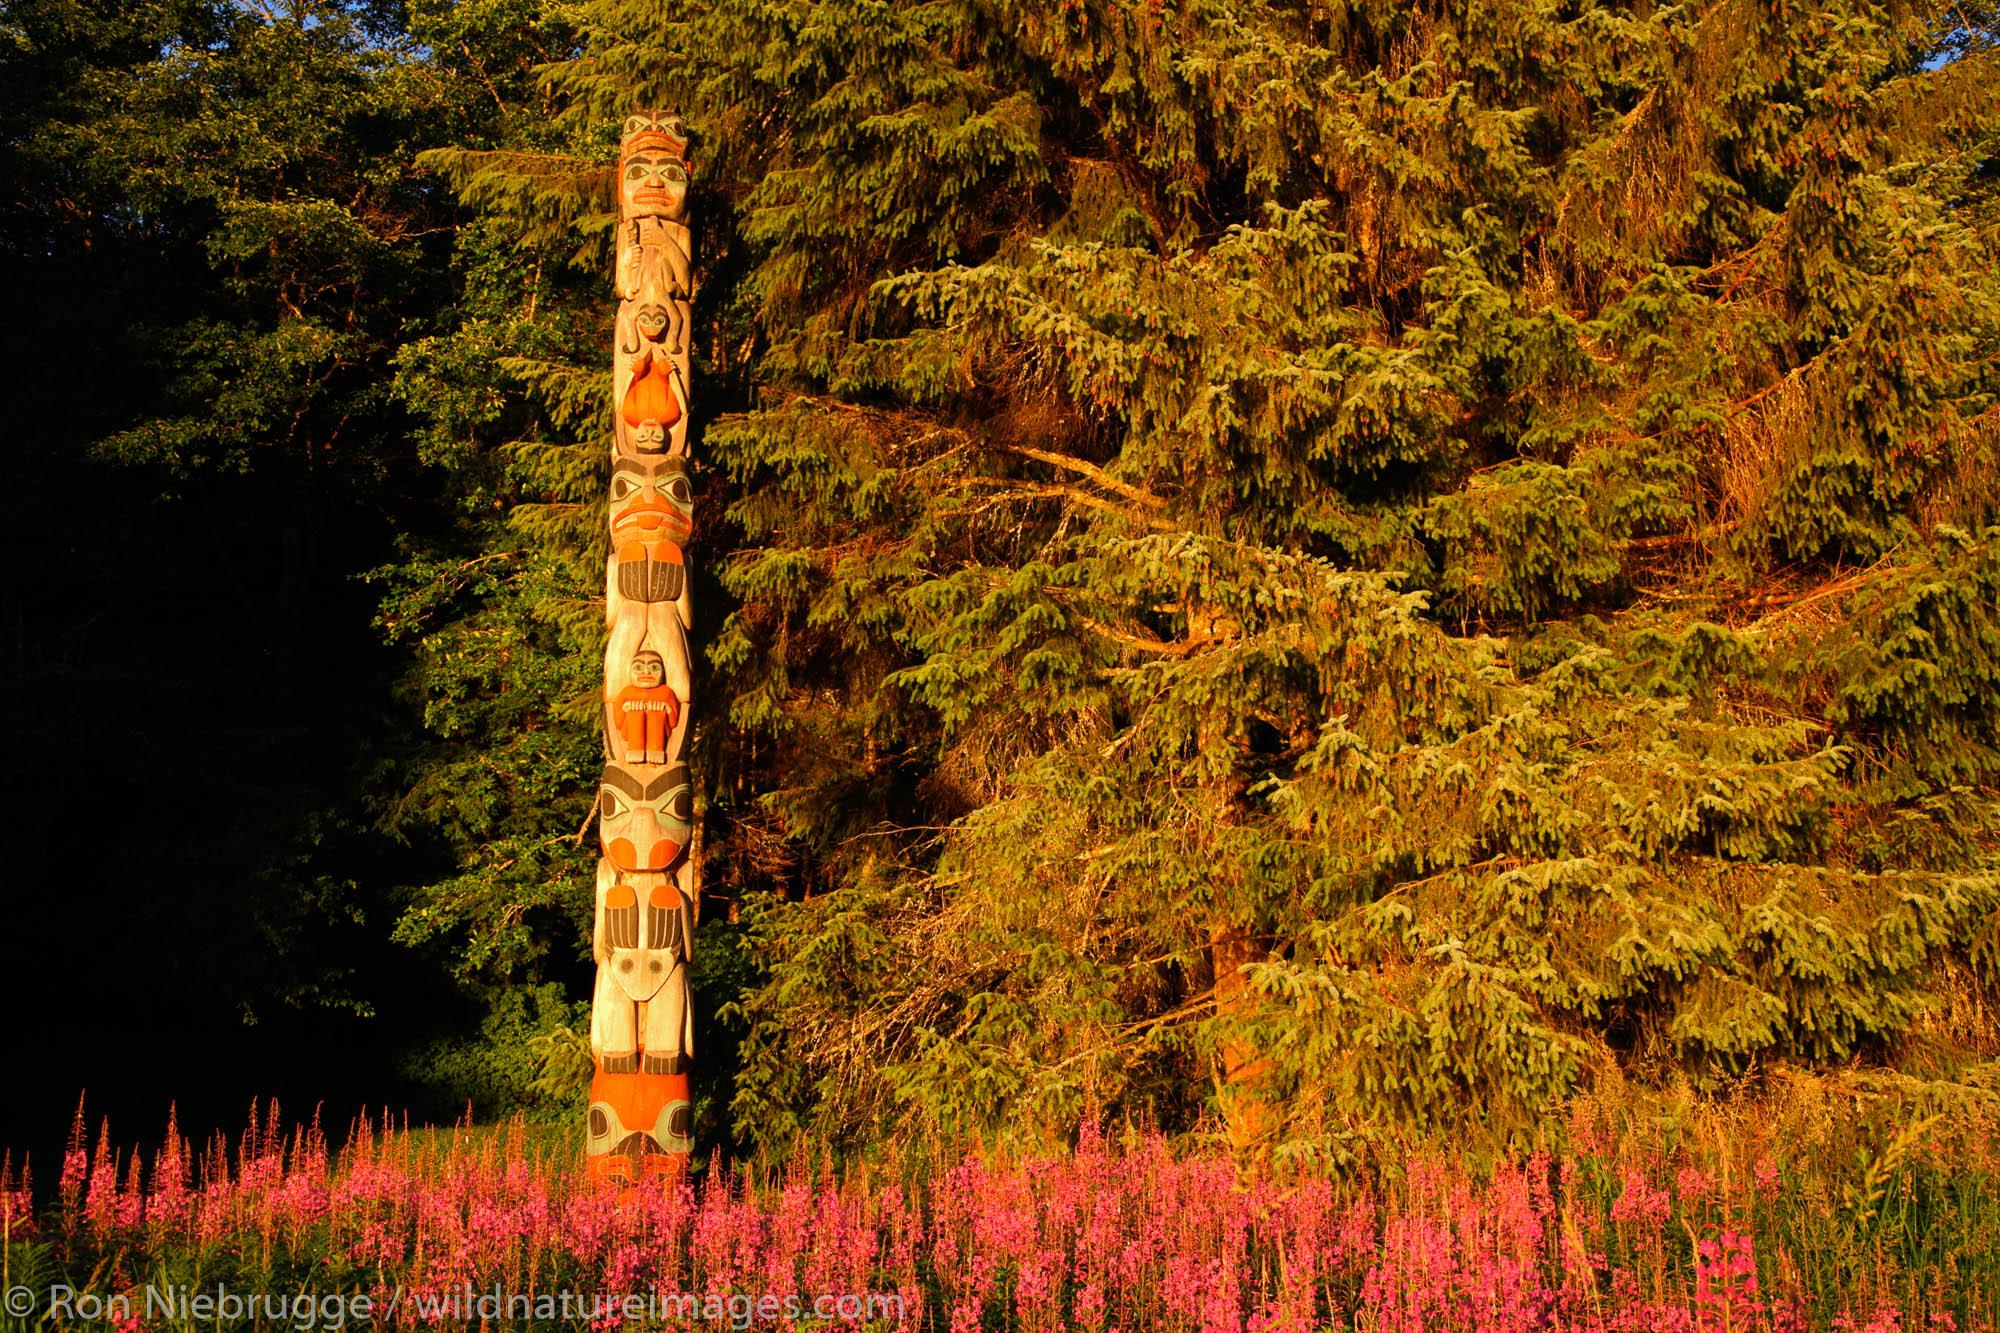 The Land Otter Pole (pole 7), Totem Bight State Historical Park, Ketchikan, Alaska